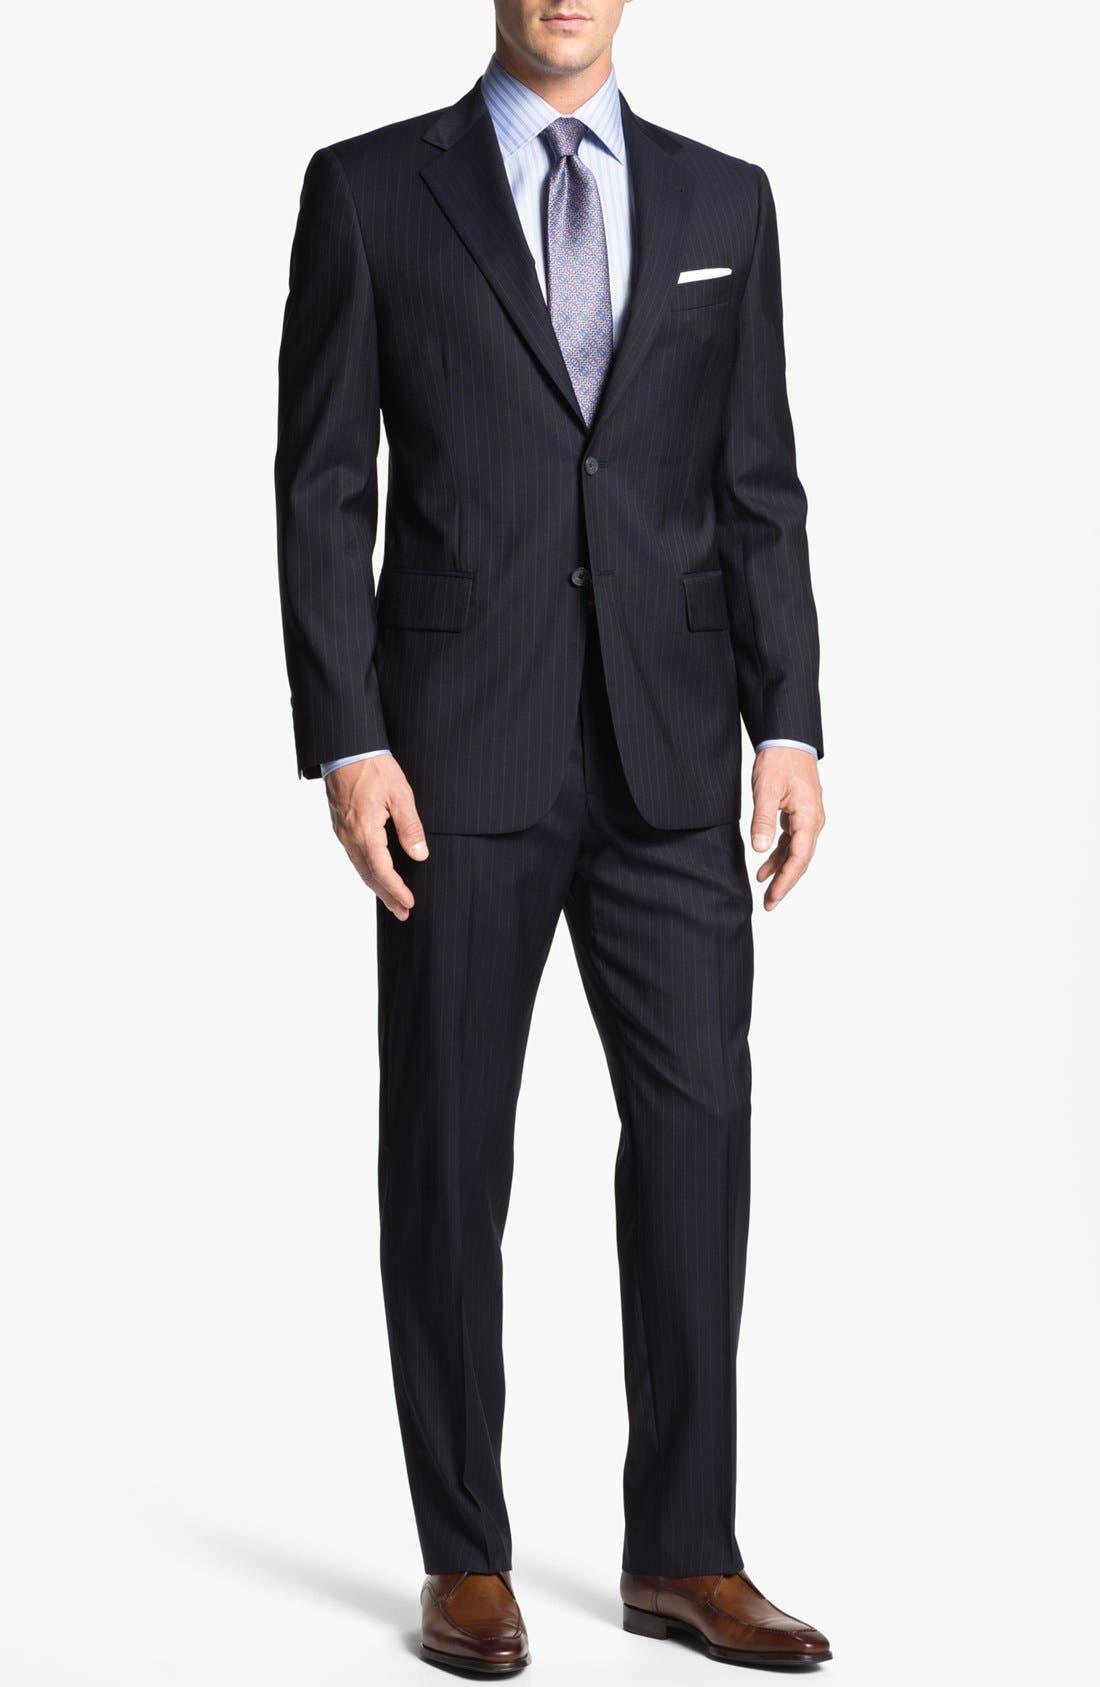 Main Image - Joseph Abboud 'Signature Silver' Stripe Wool Suit